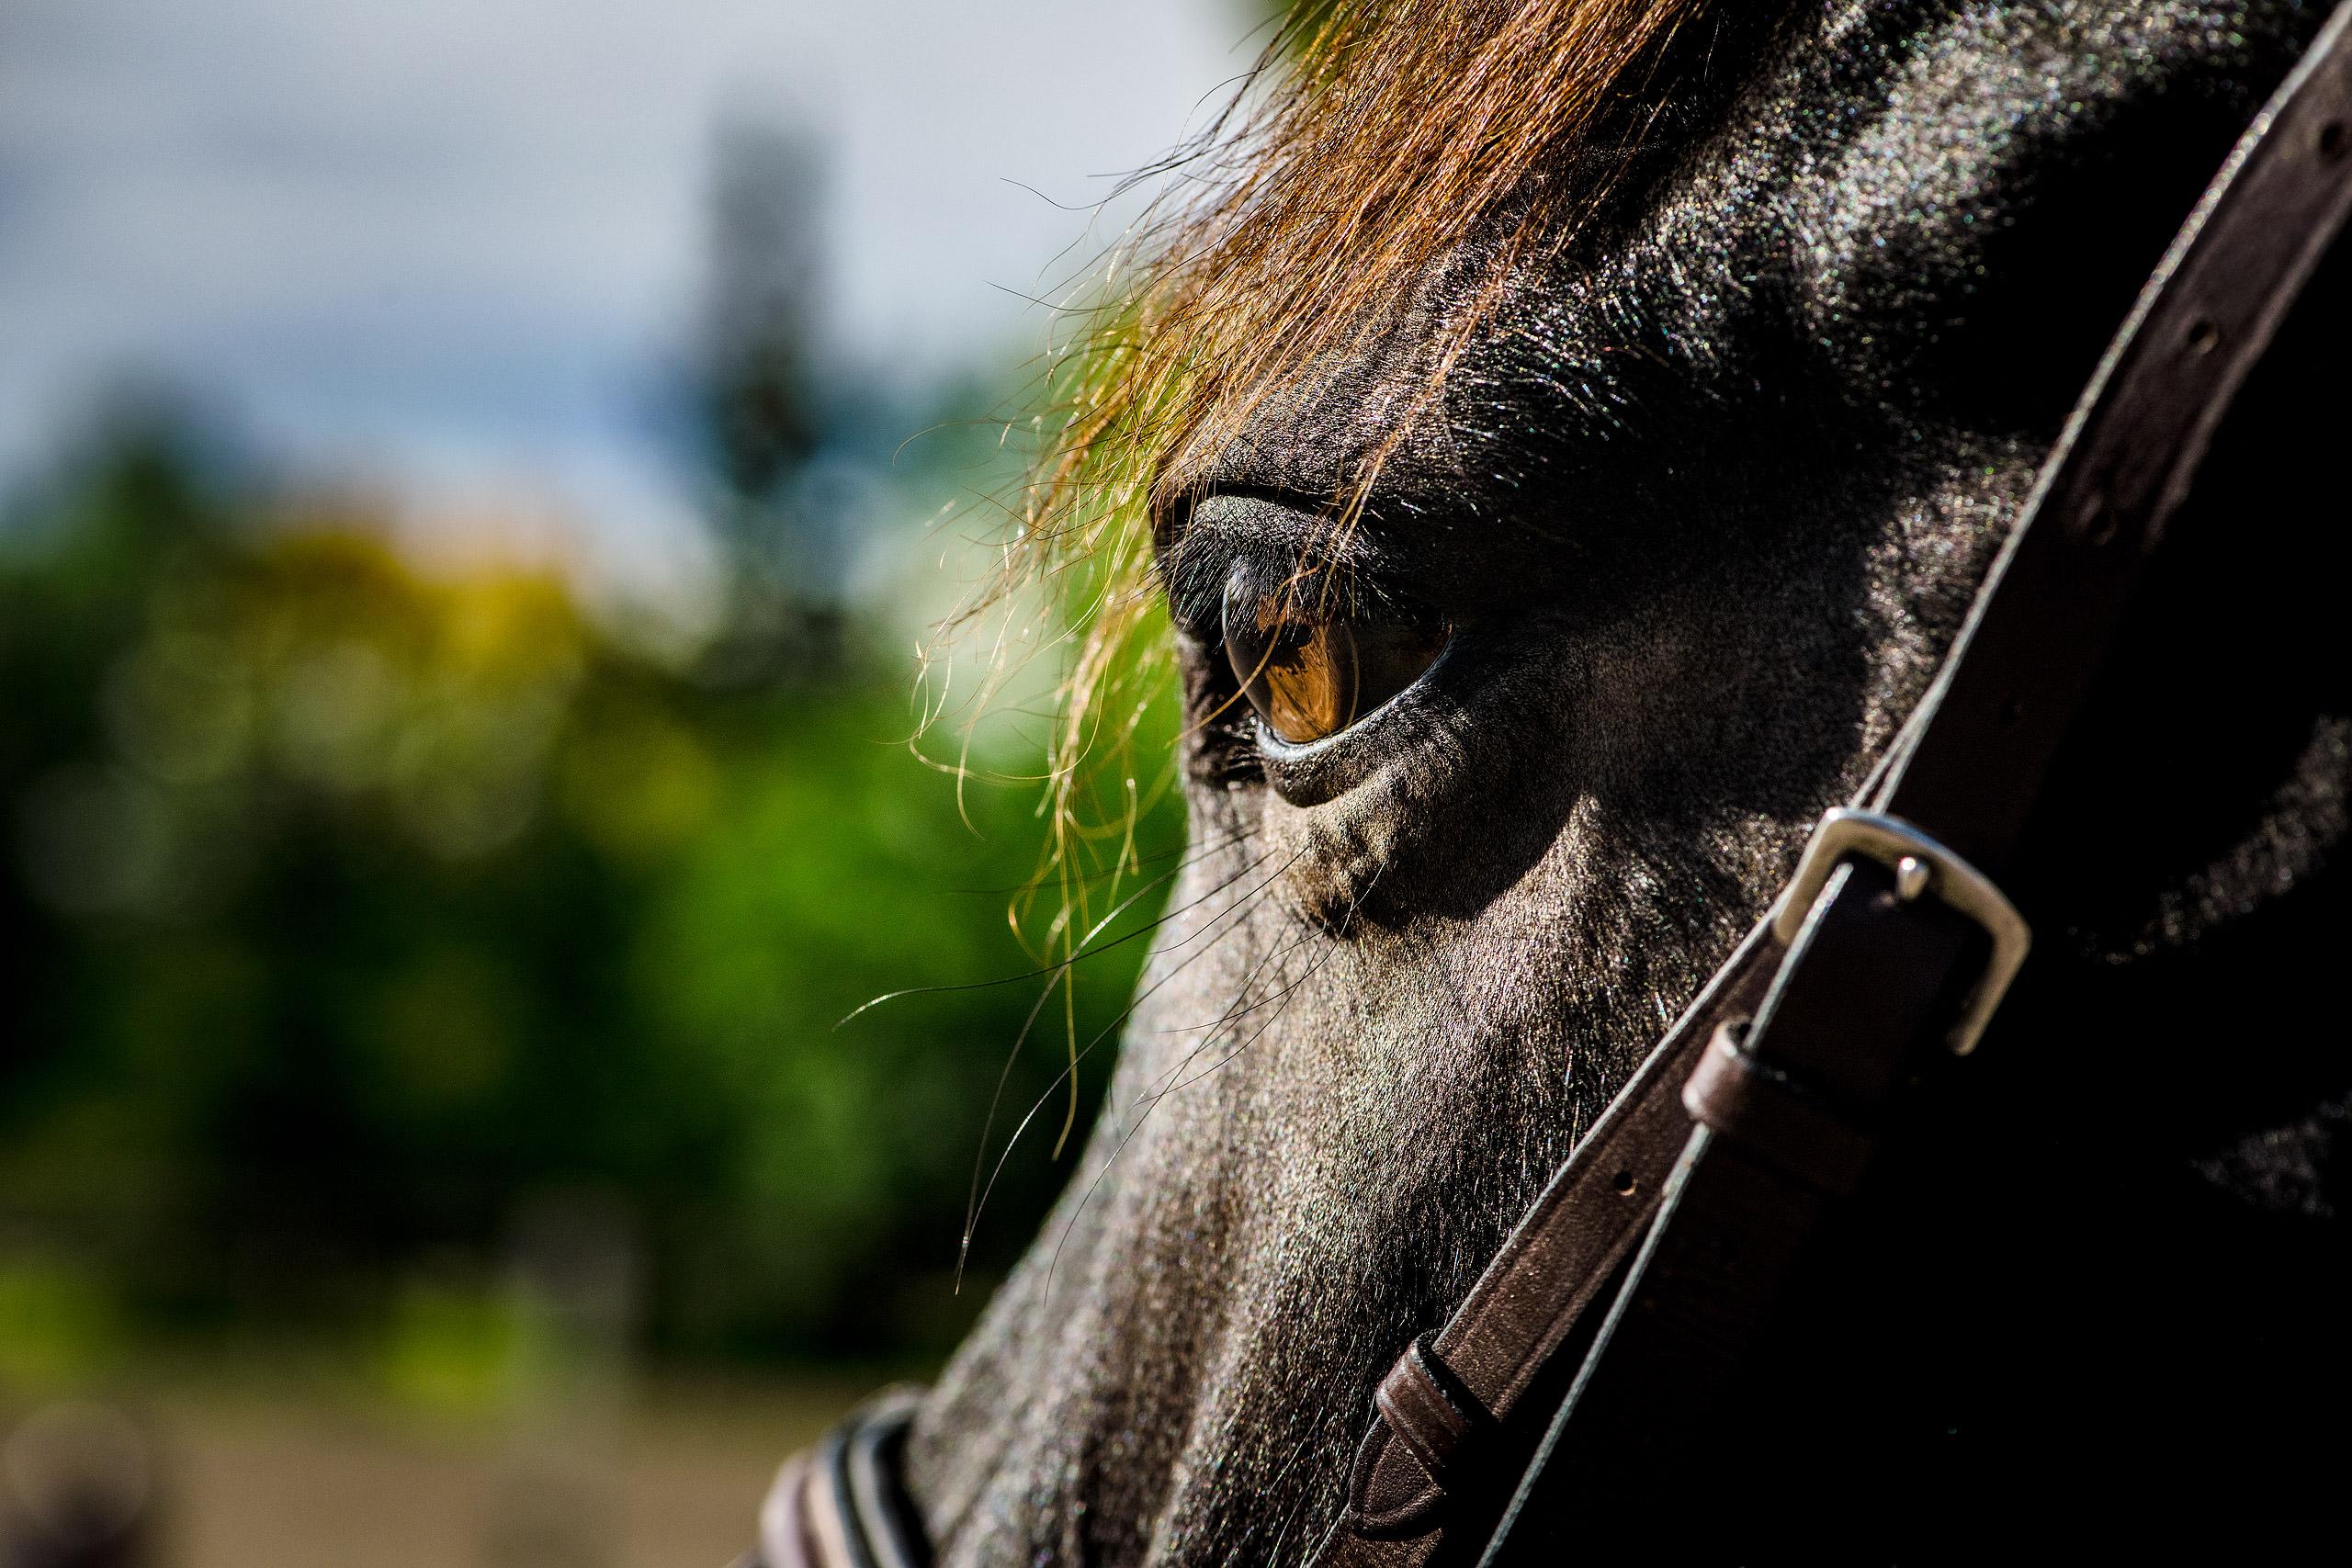 the eye of a dark brown horse by portrait photographer sean leblanc